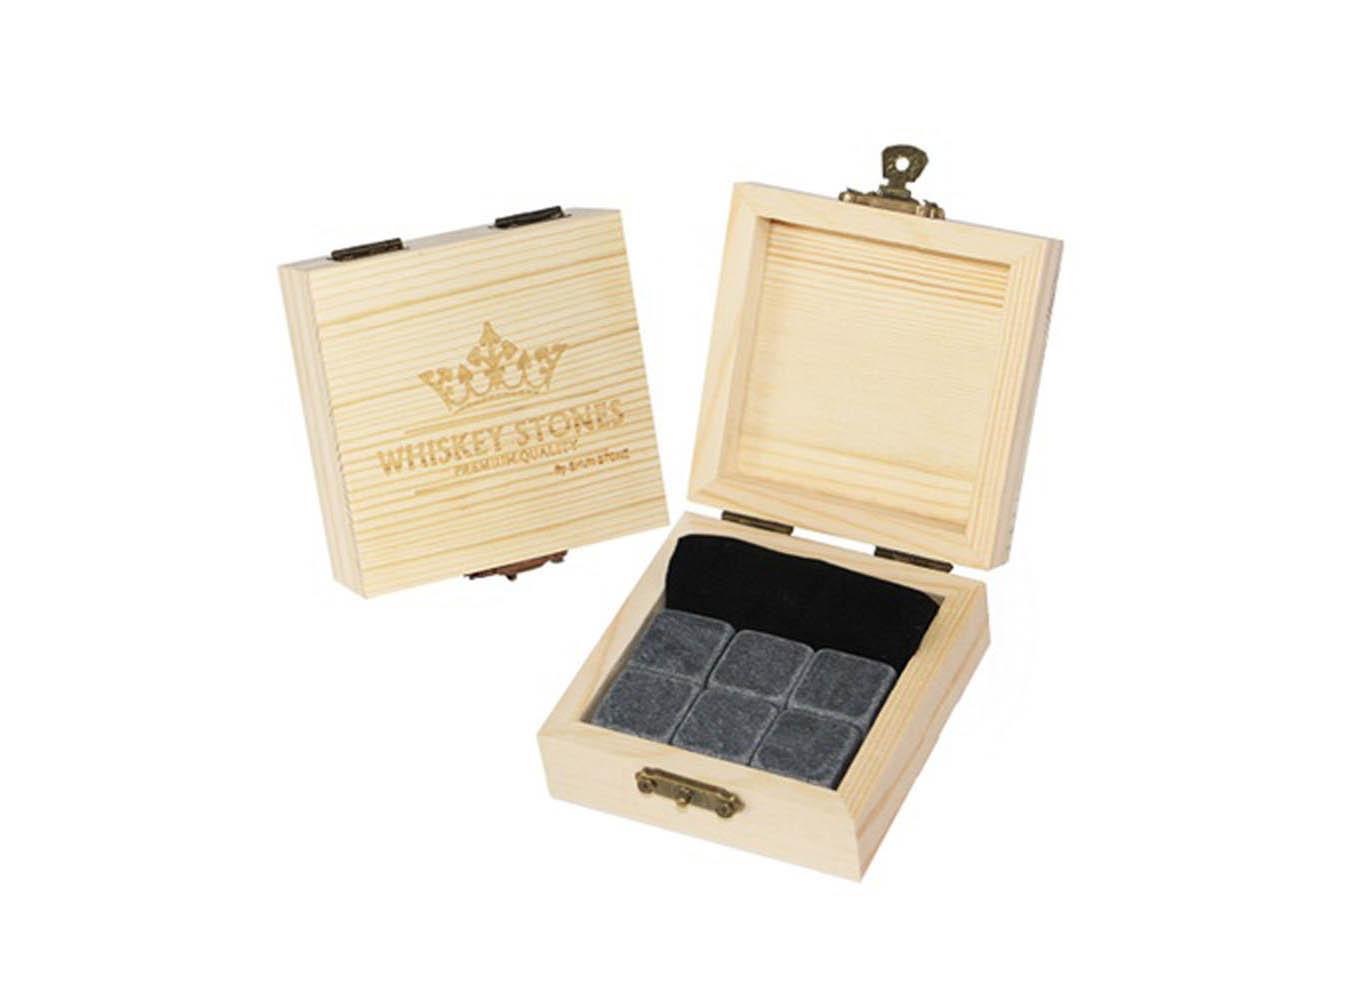 Food-Safe Whiskey Stone Custom Wooden Gift Box Set